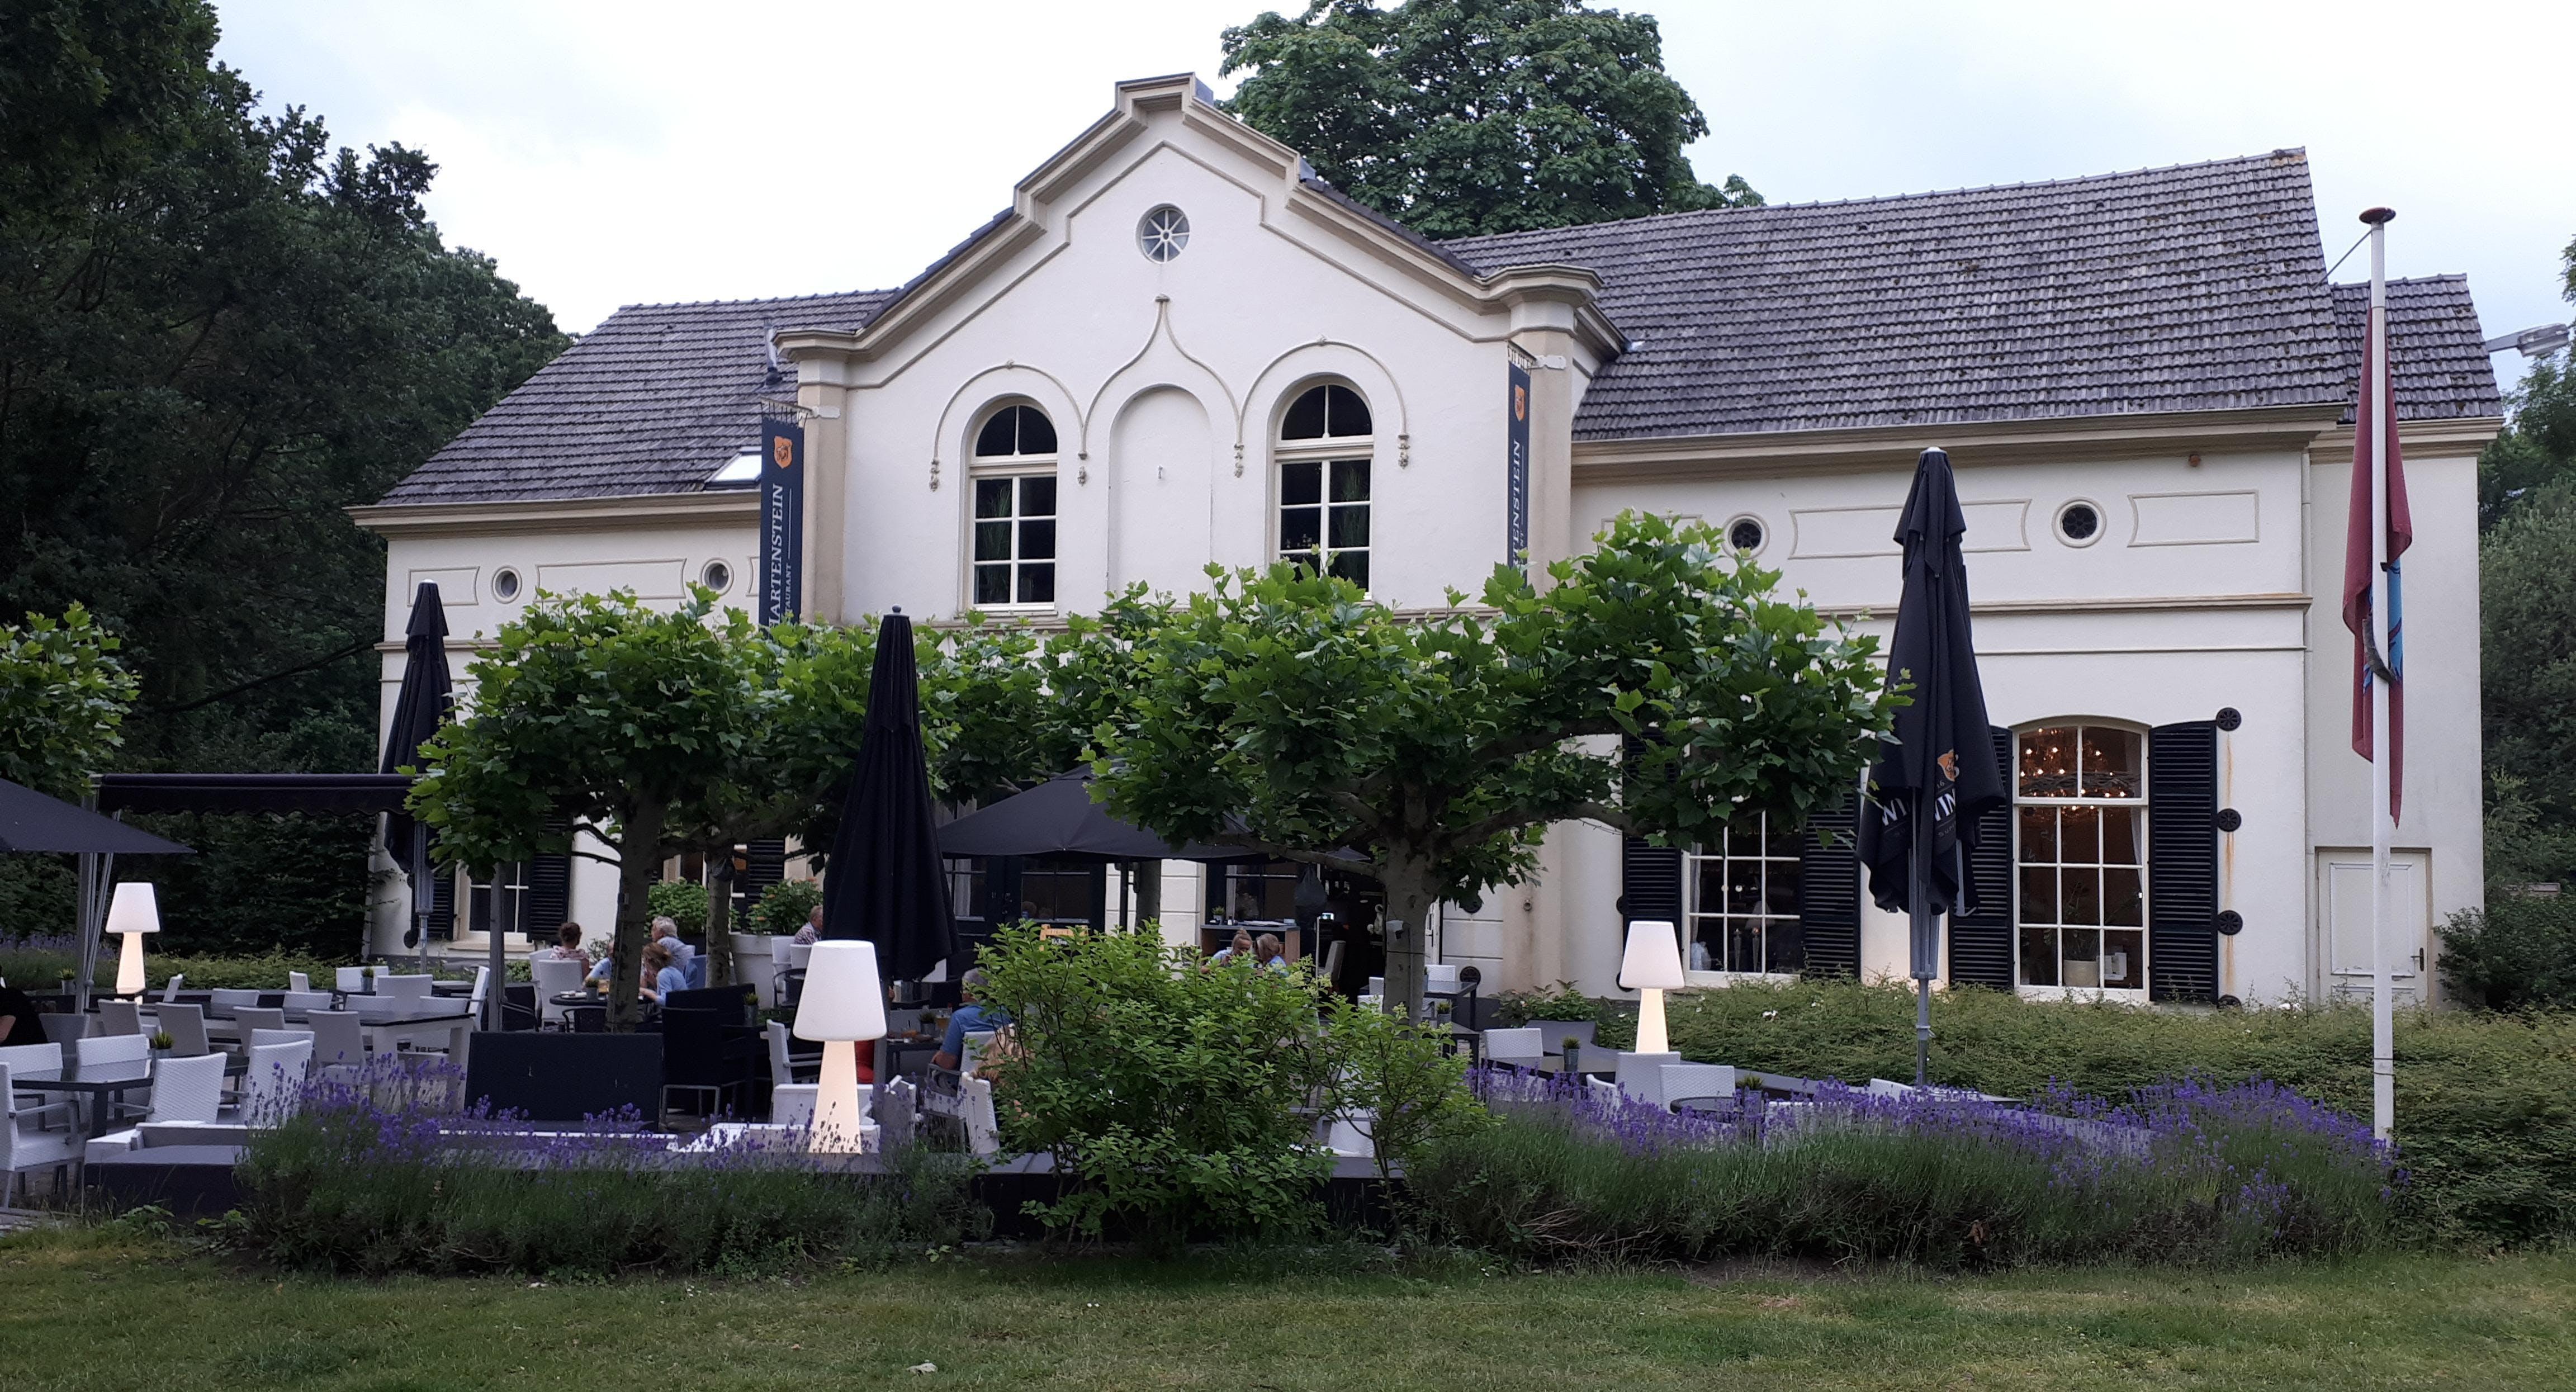 Restaurant Klein Hartenstein Oosterbeek image 3